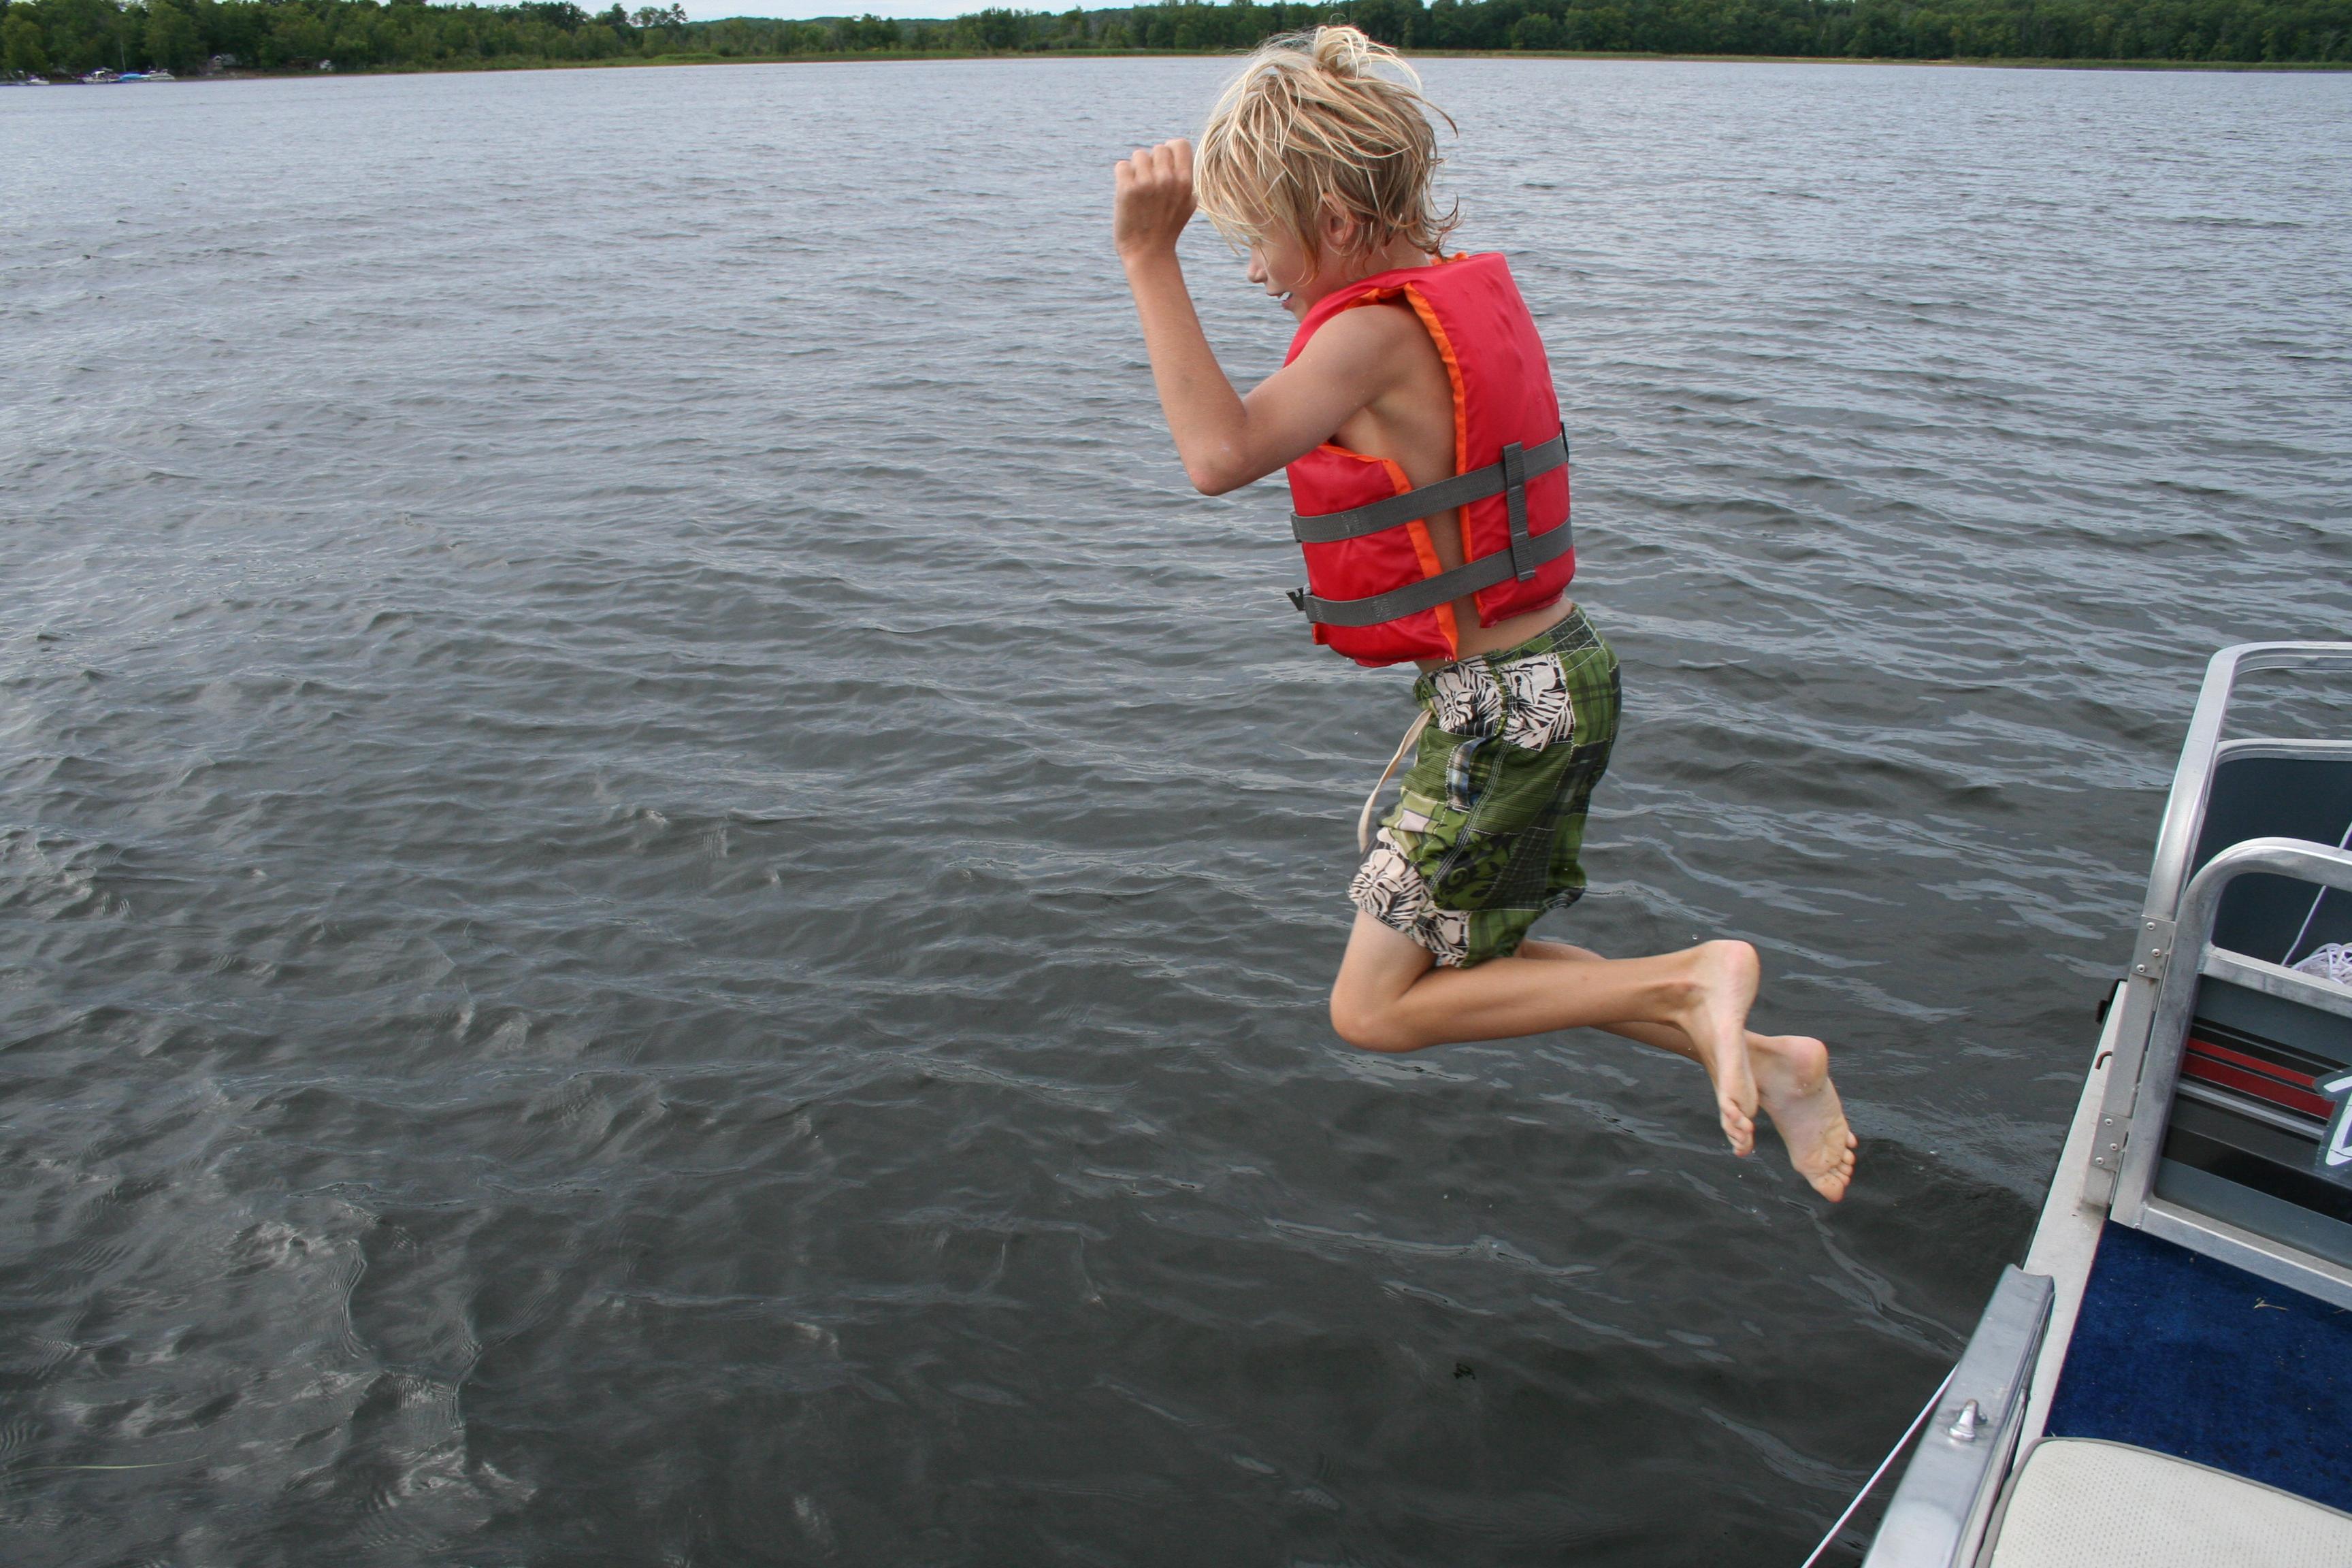 jump off the boat borealis